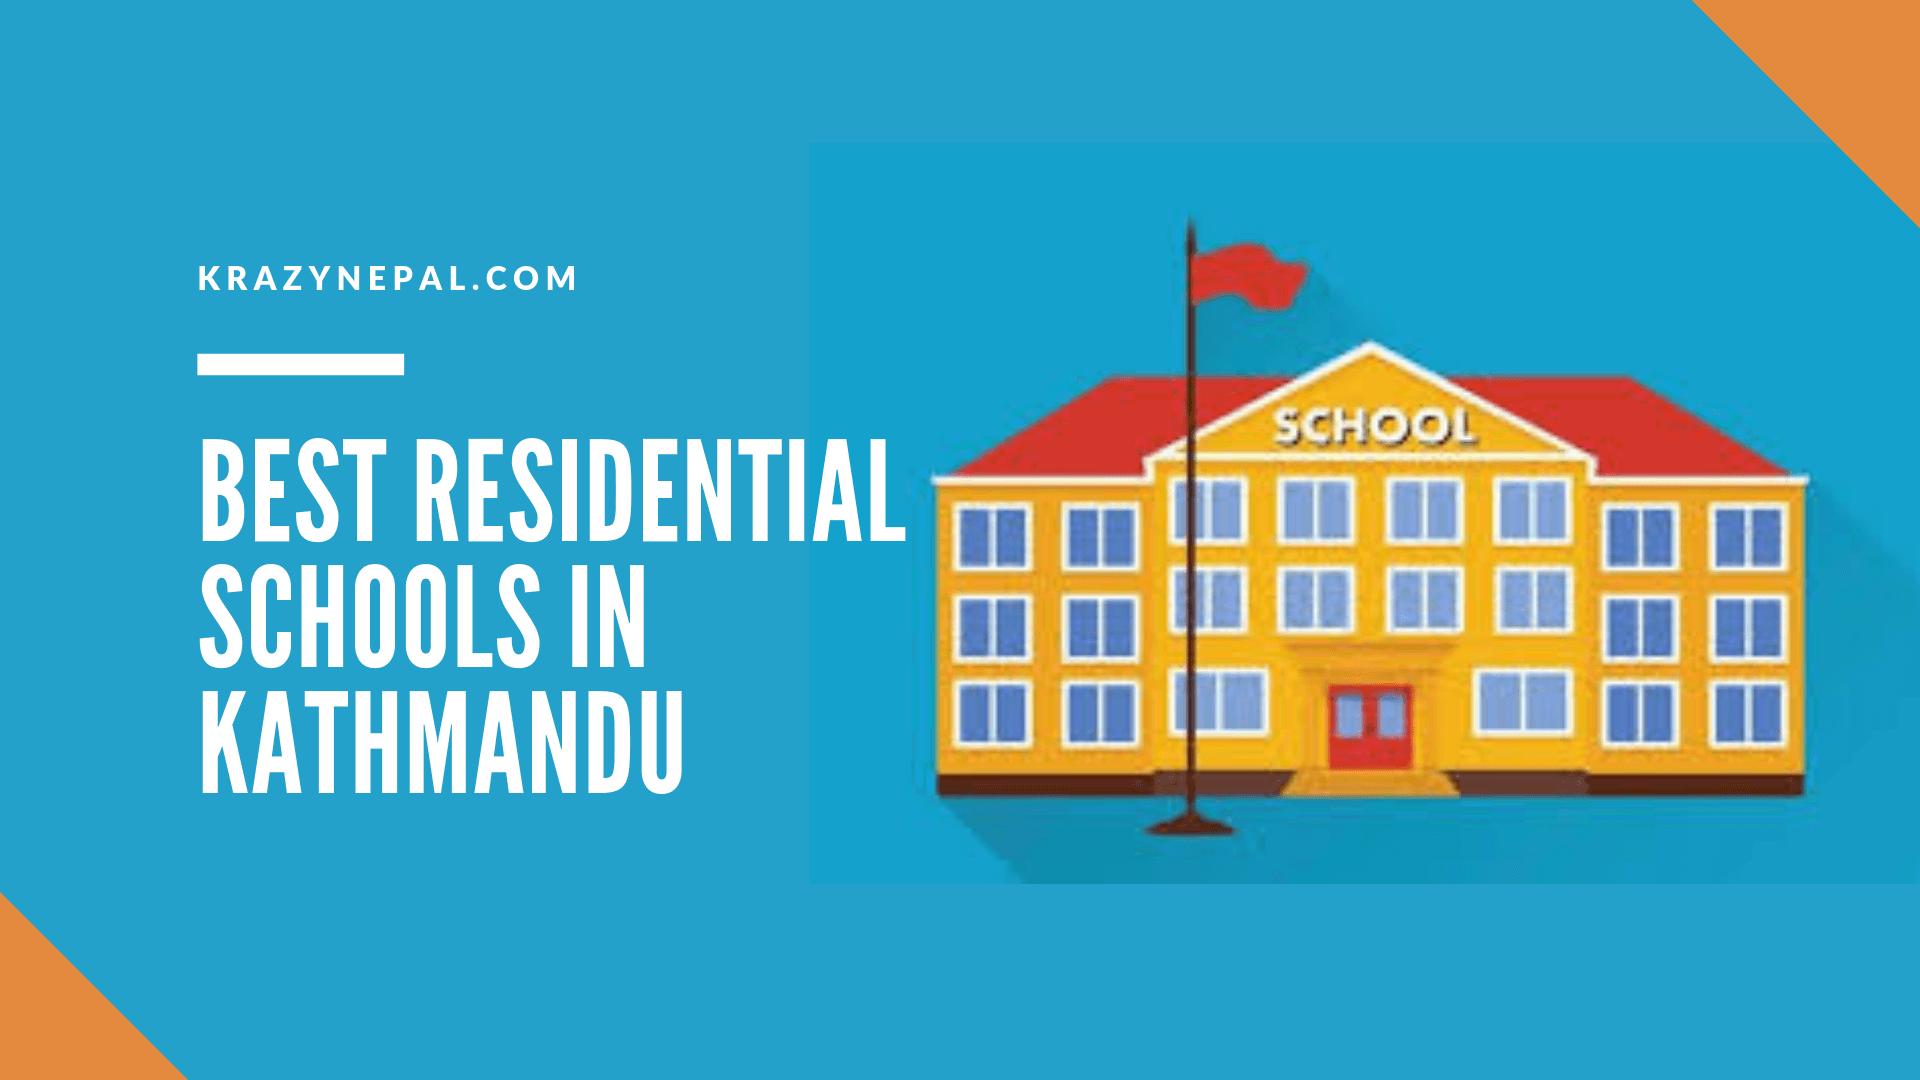 best residential school in kathmandu